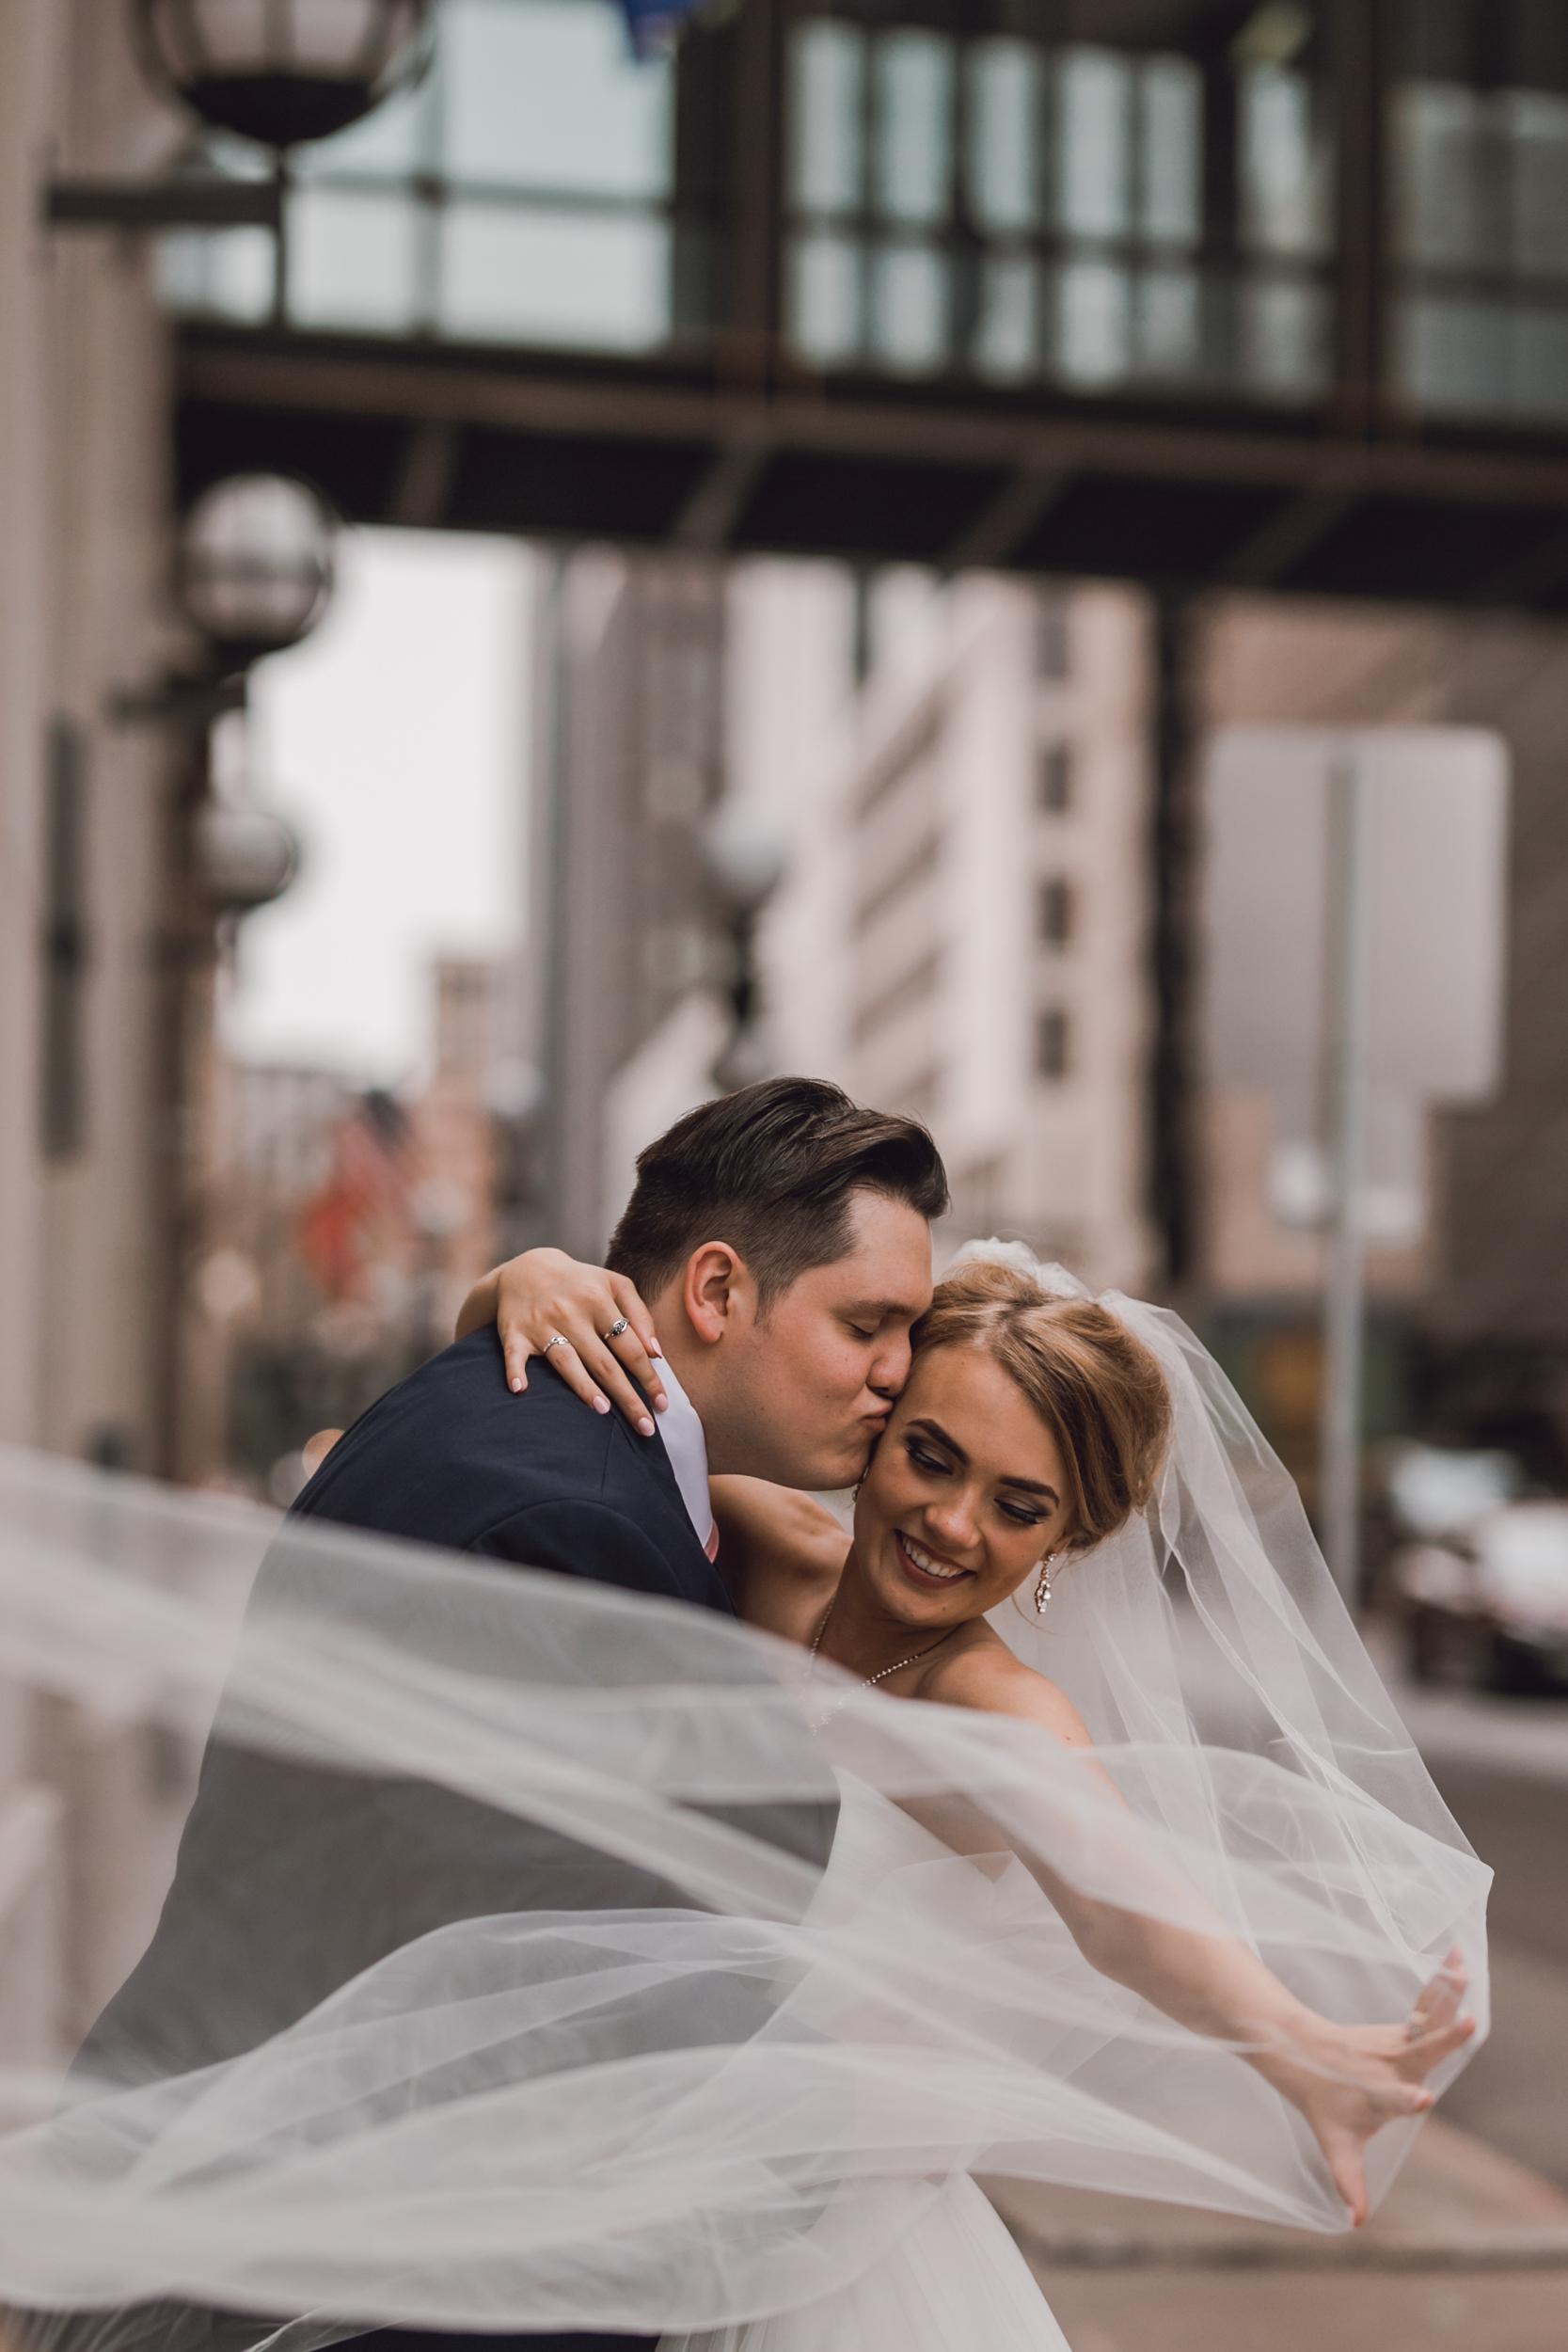 Weddings, Engagements, Elopements, Boudoir, & Stylized Shoots -